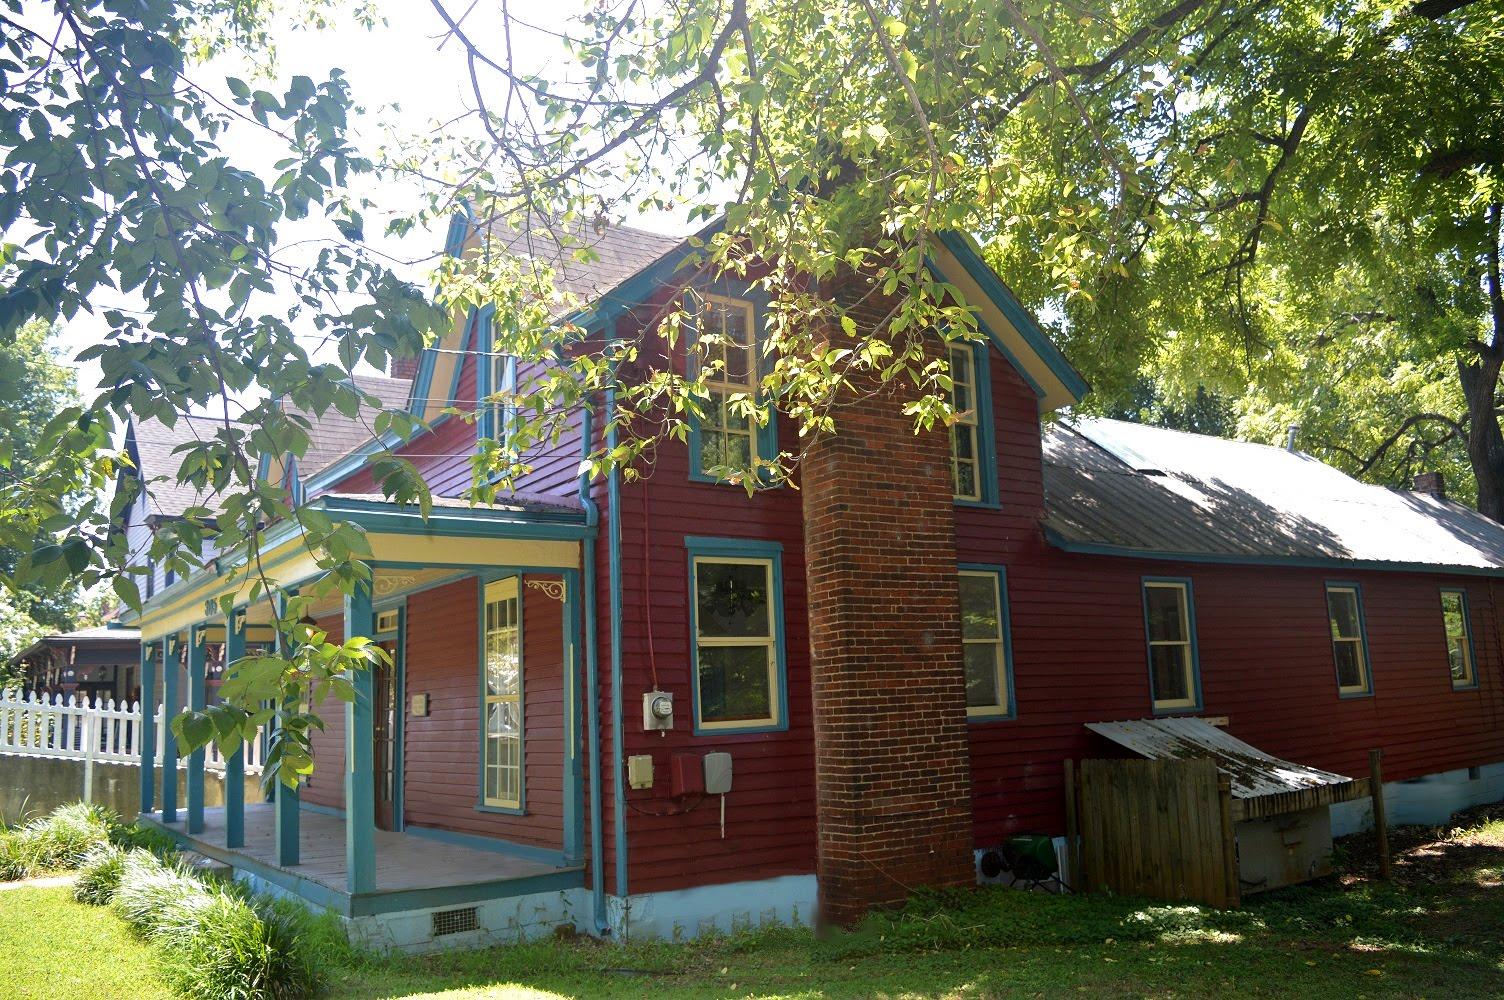 305 E. Bank Street, Salisbury NC 28144 ~ circa 1883 ~ $100,000